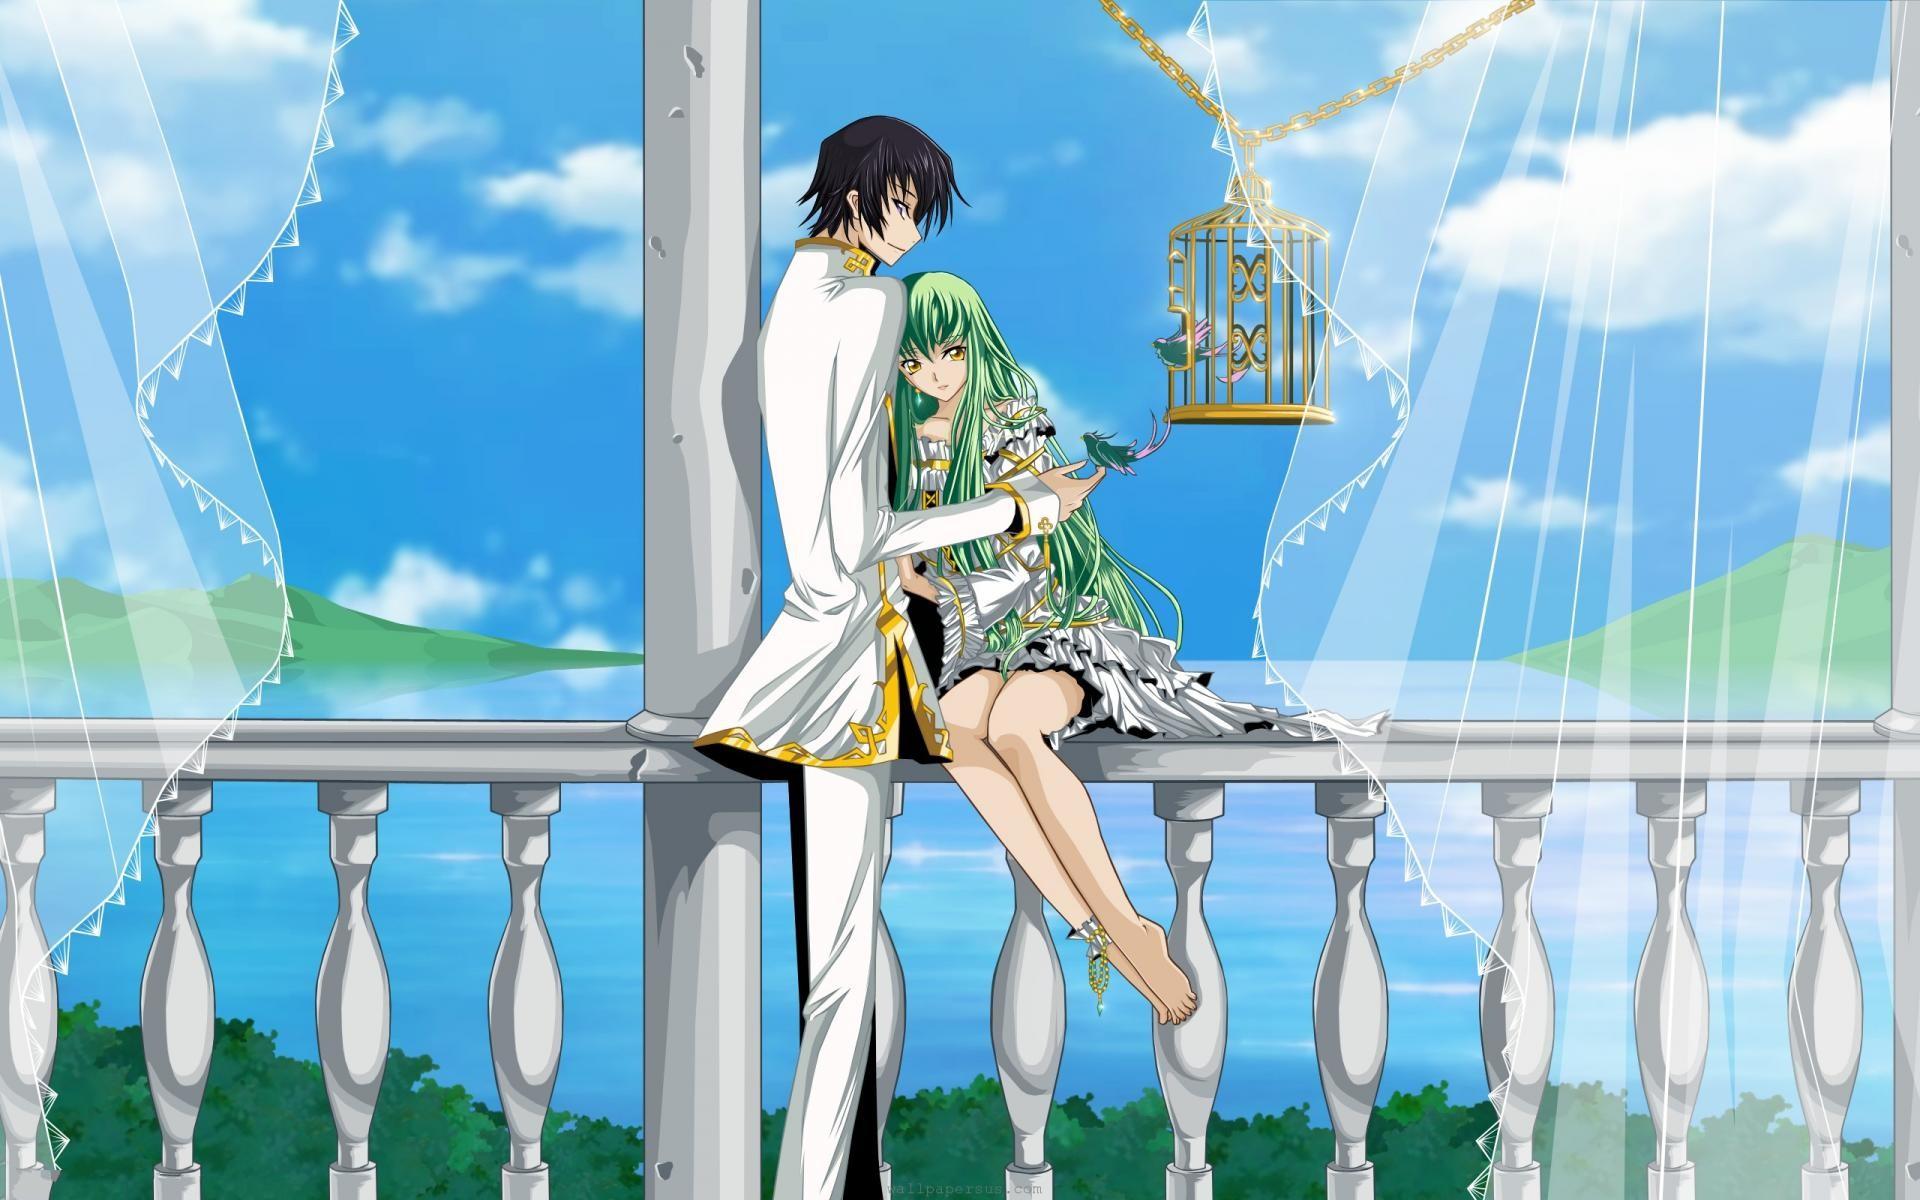 Res: 1920x1200, Full HD Anime Couple Desktop Background